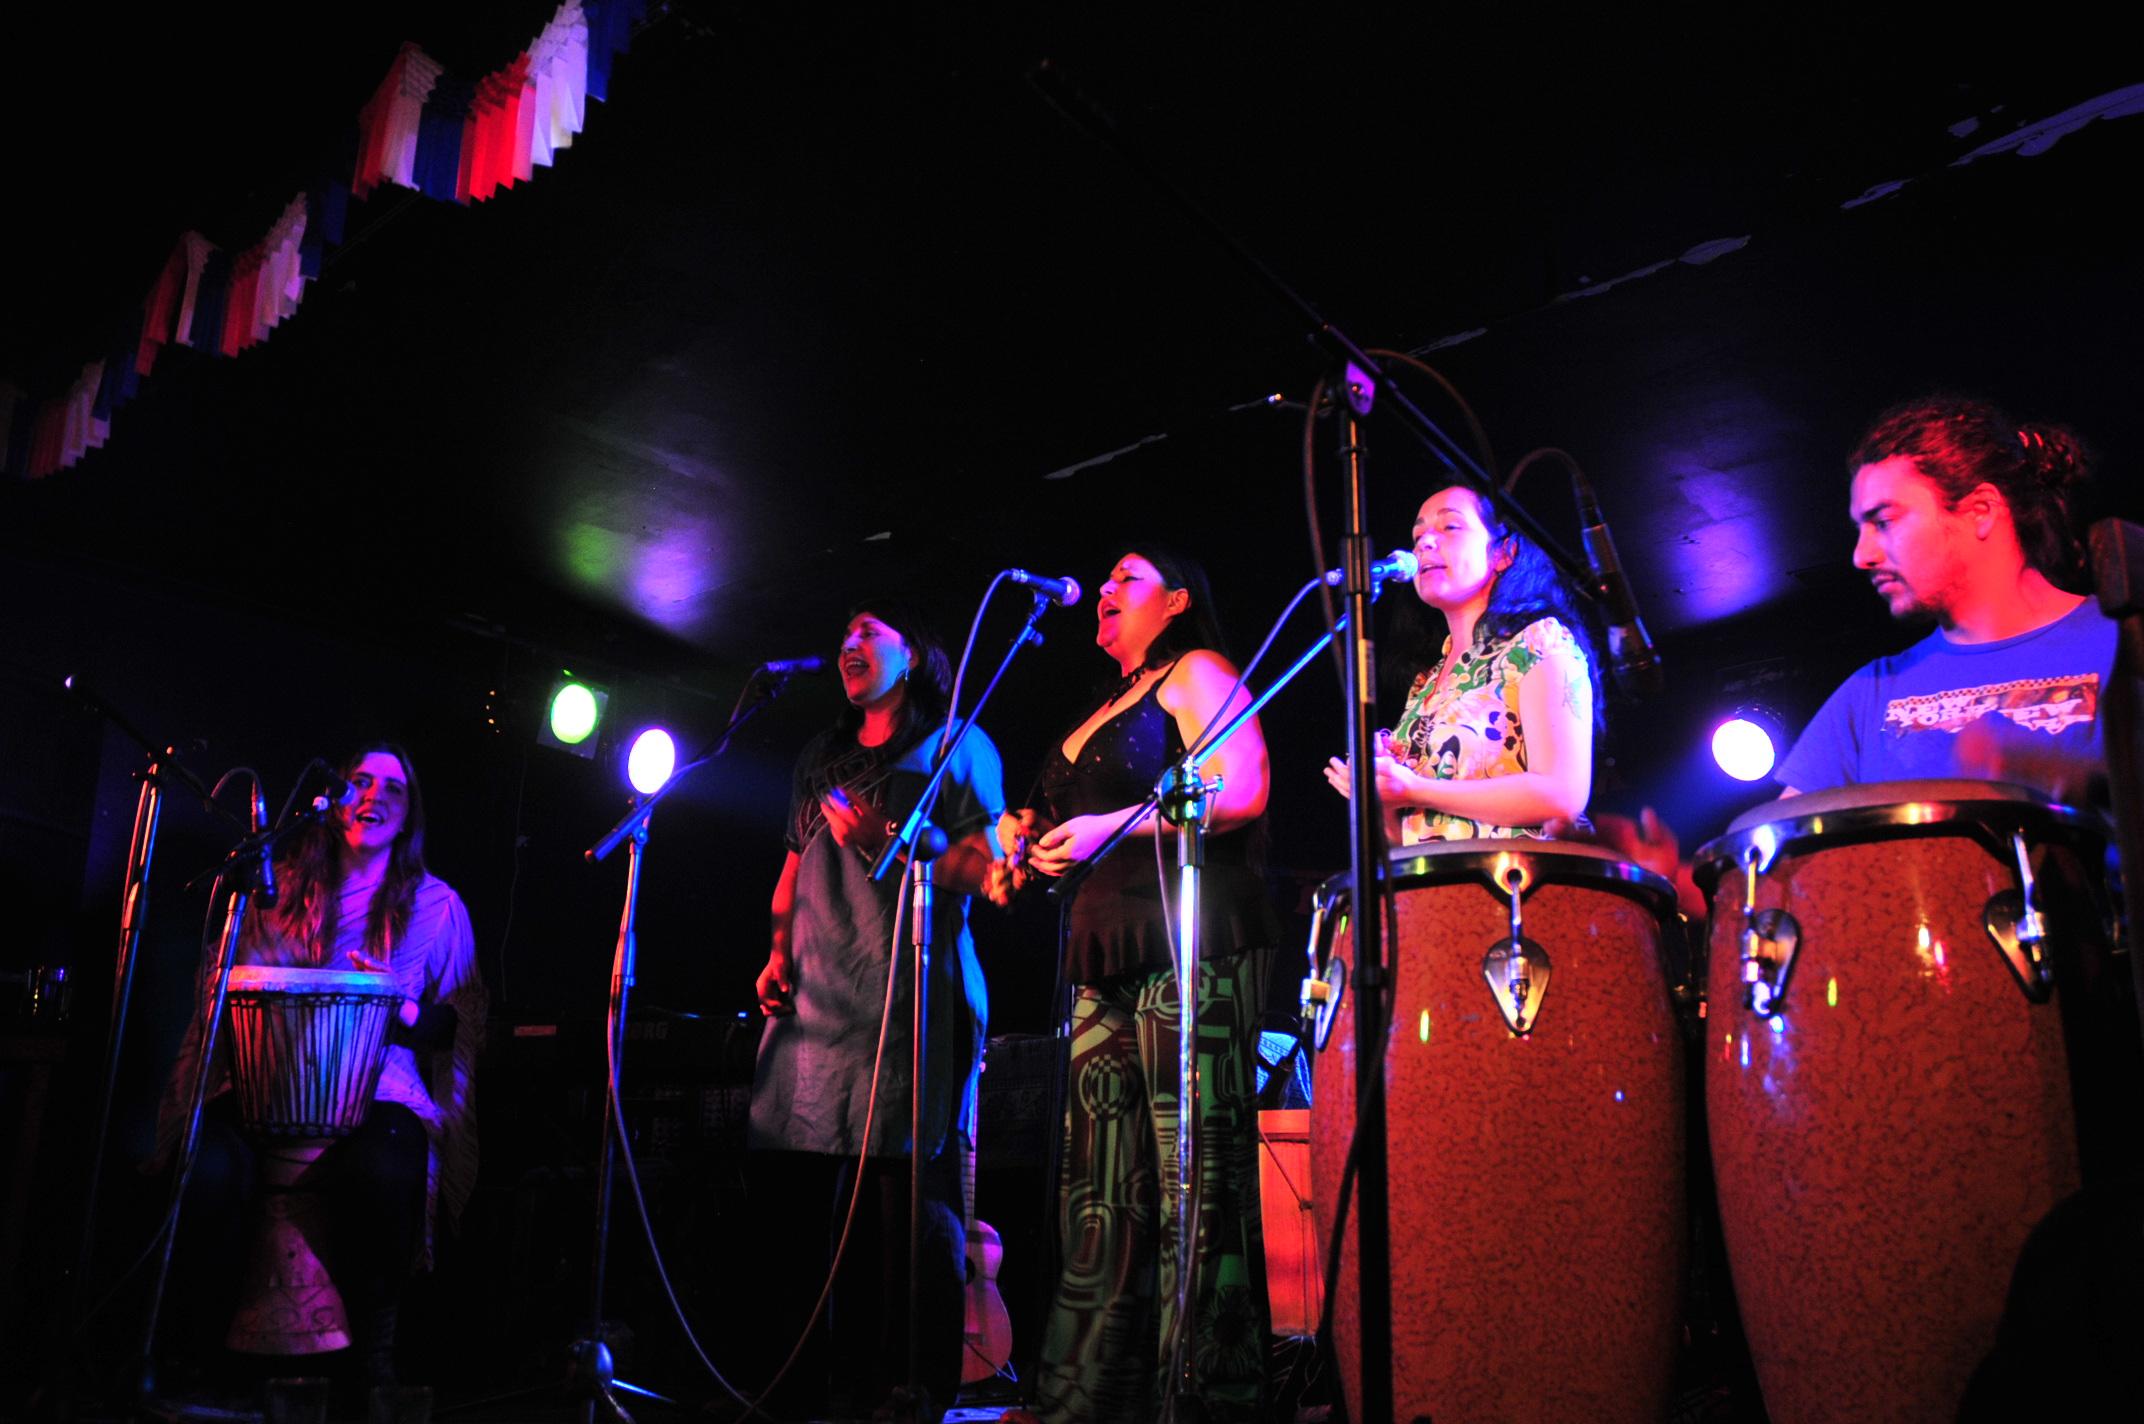 La barcaza 2009